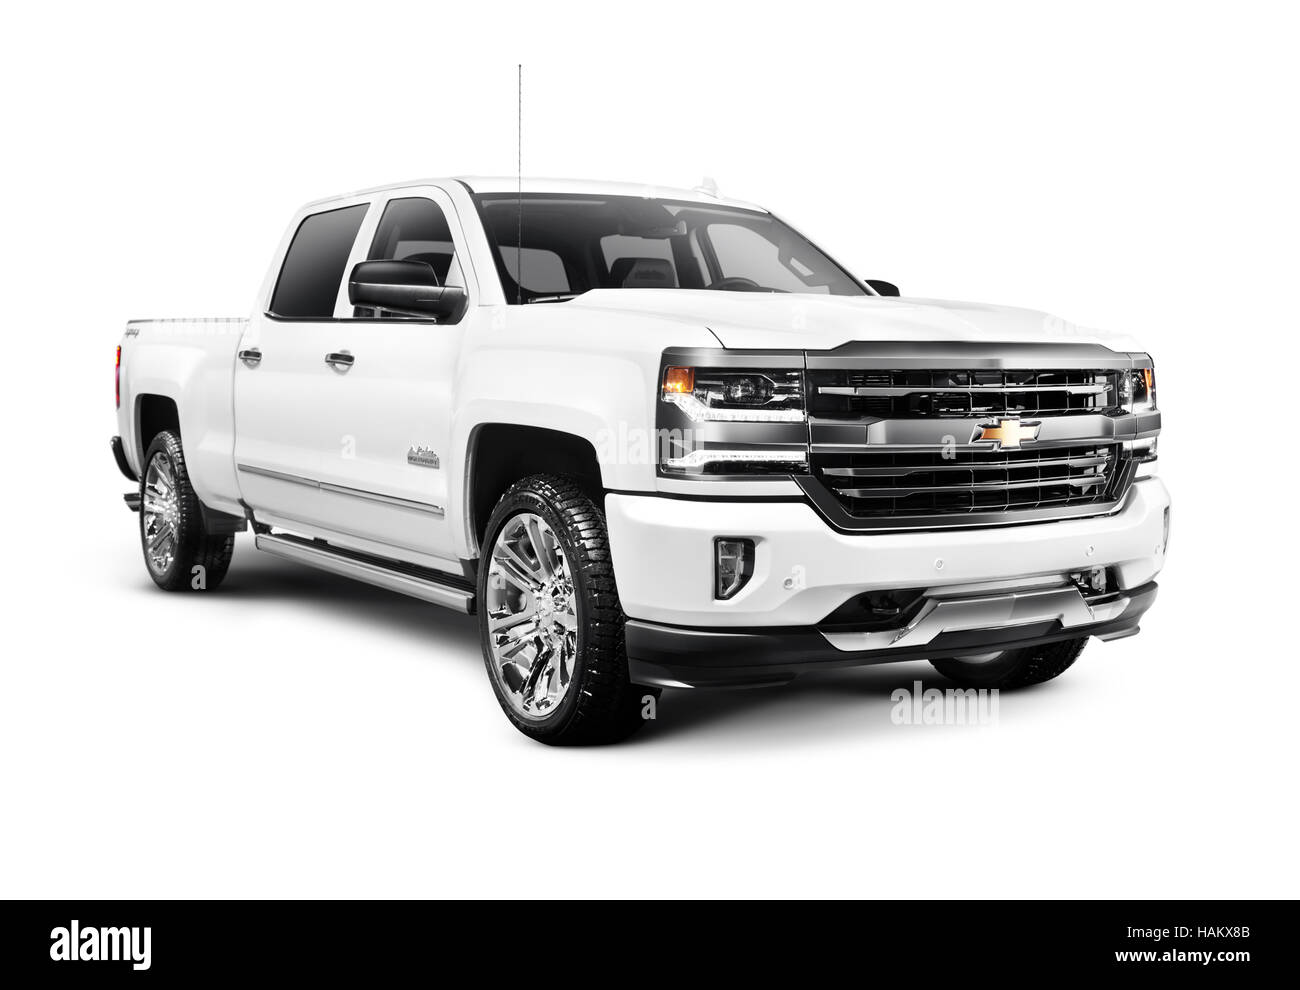 2017 White Chevy Silverado >> Chevy Pickup Truck American Car Stock Photos & Chevy Pickup Truck American Car Stock Images - Alamy